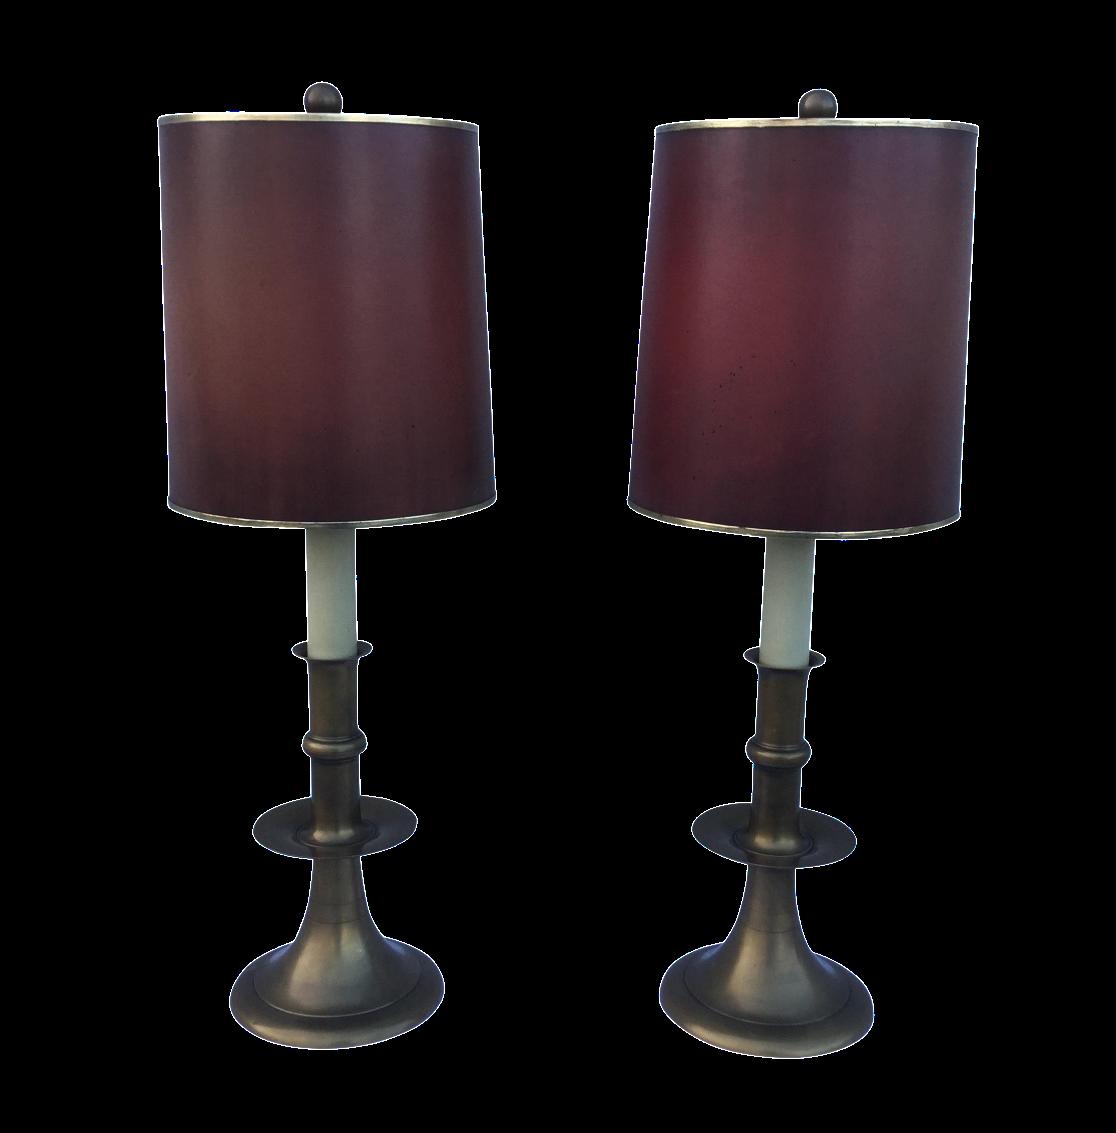 Chapman 1960s Modern Brass Table Lamps A Pair Chairish